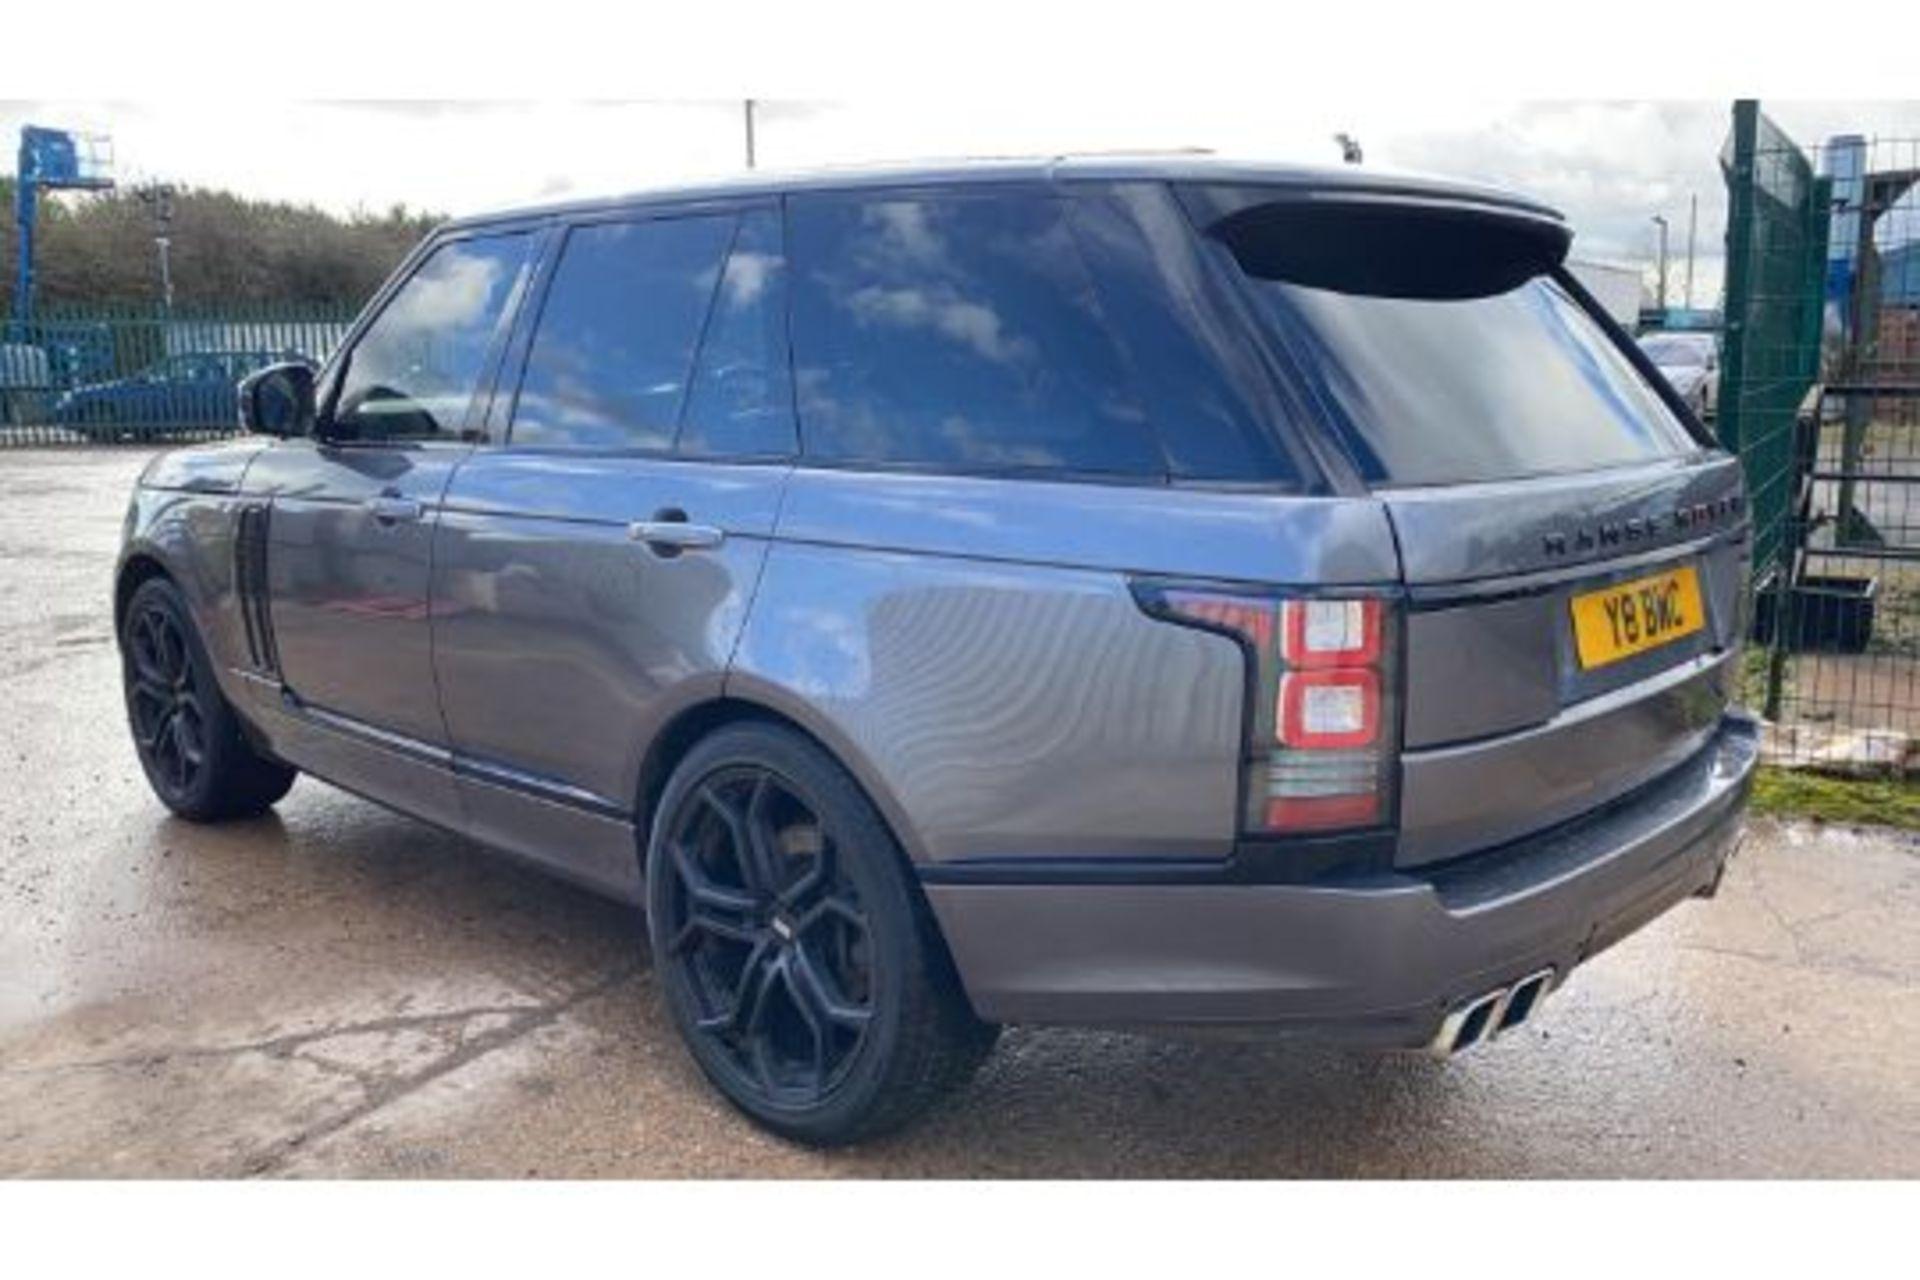 Range Rover Vogue 3.0 TDV6 SE Auto - Black Pack - NEW SHAPE - FULLY LOADED - Pan Roof - Image 5 of 30